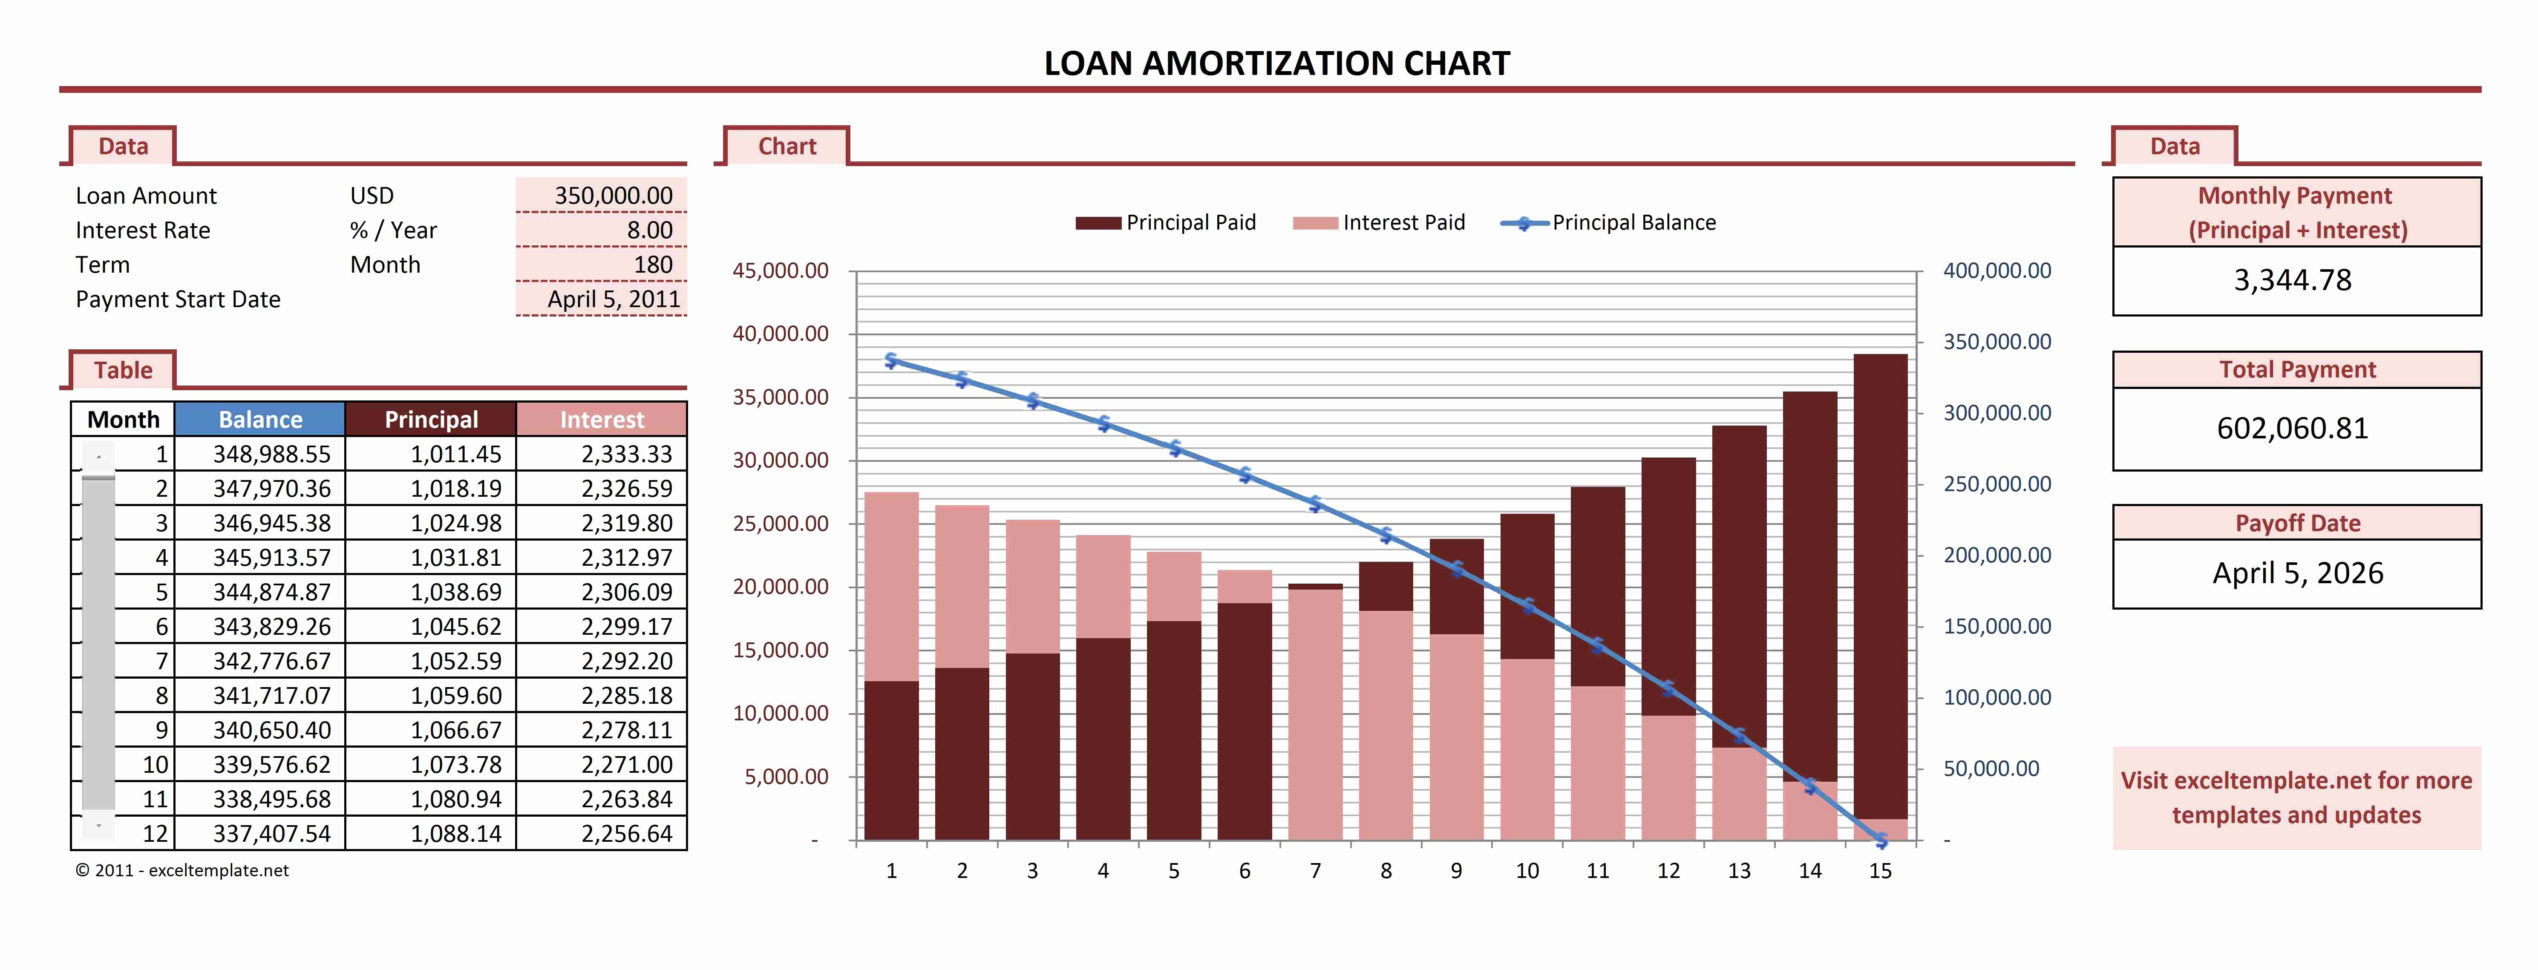 Loan Amortization Schedule Spreadsheet In Auto Loan Amortization Schedule Excel Template Elegant Inspirational